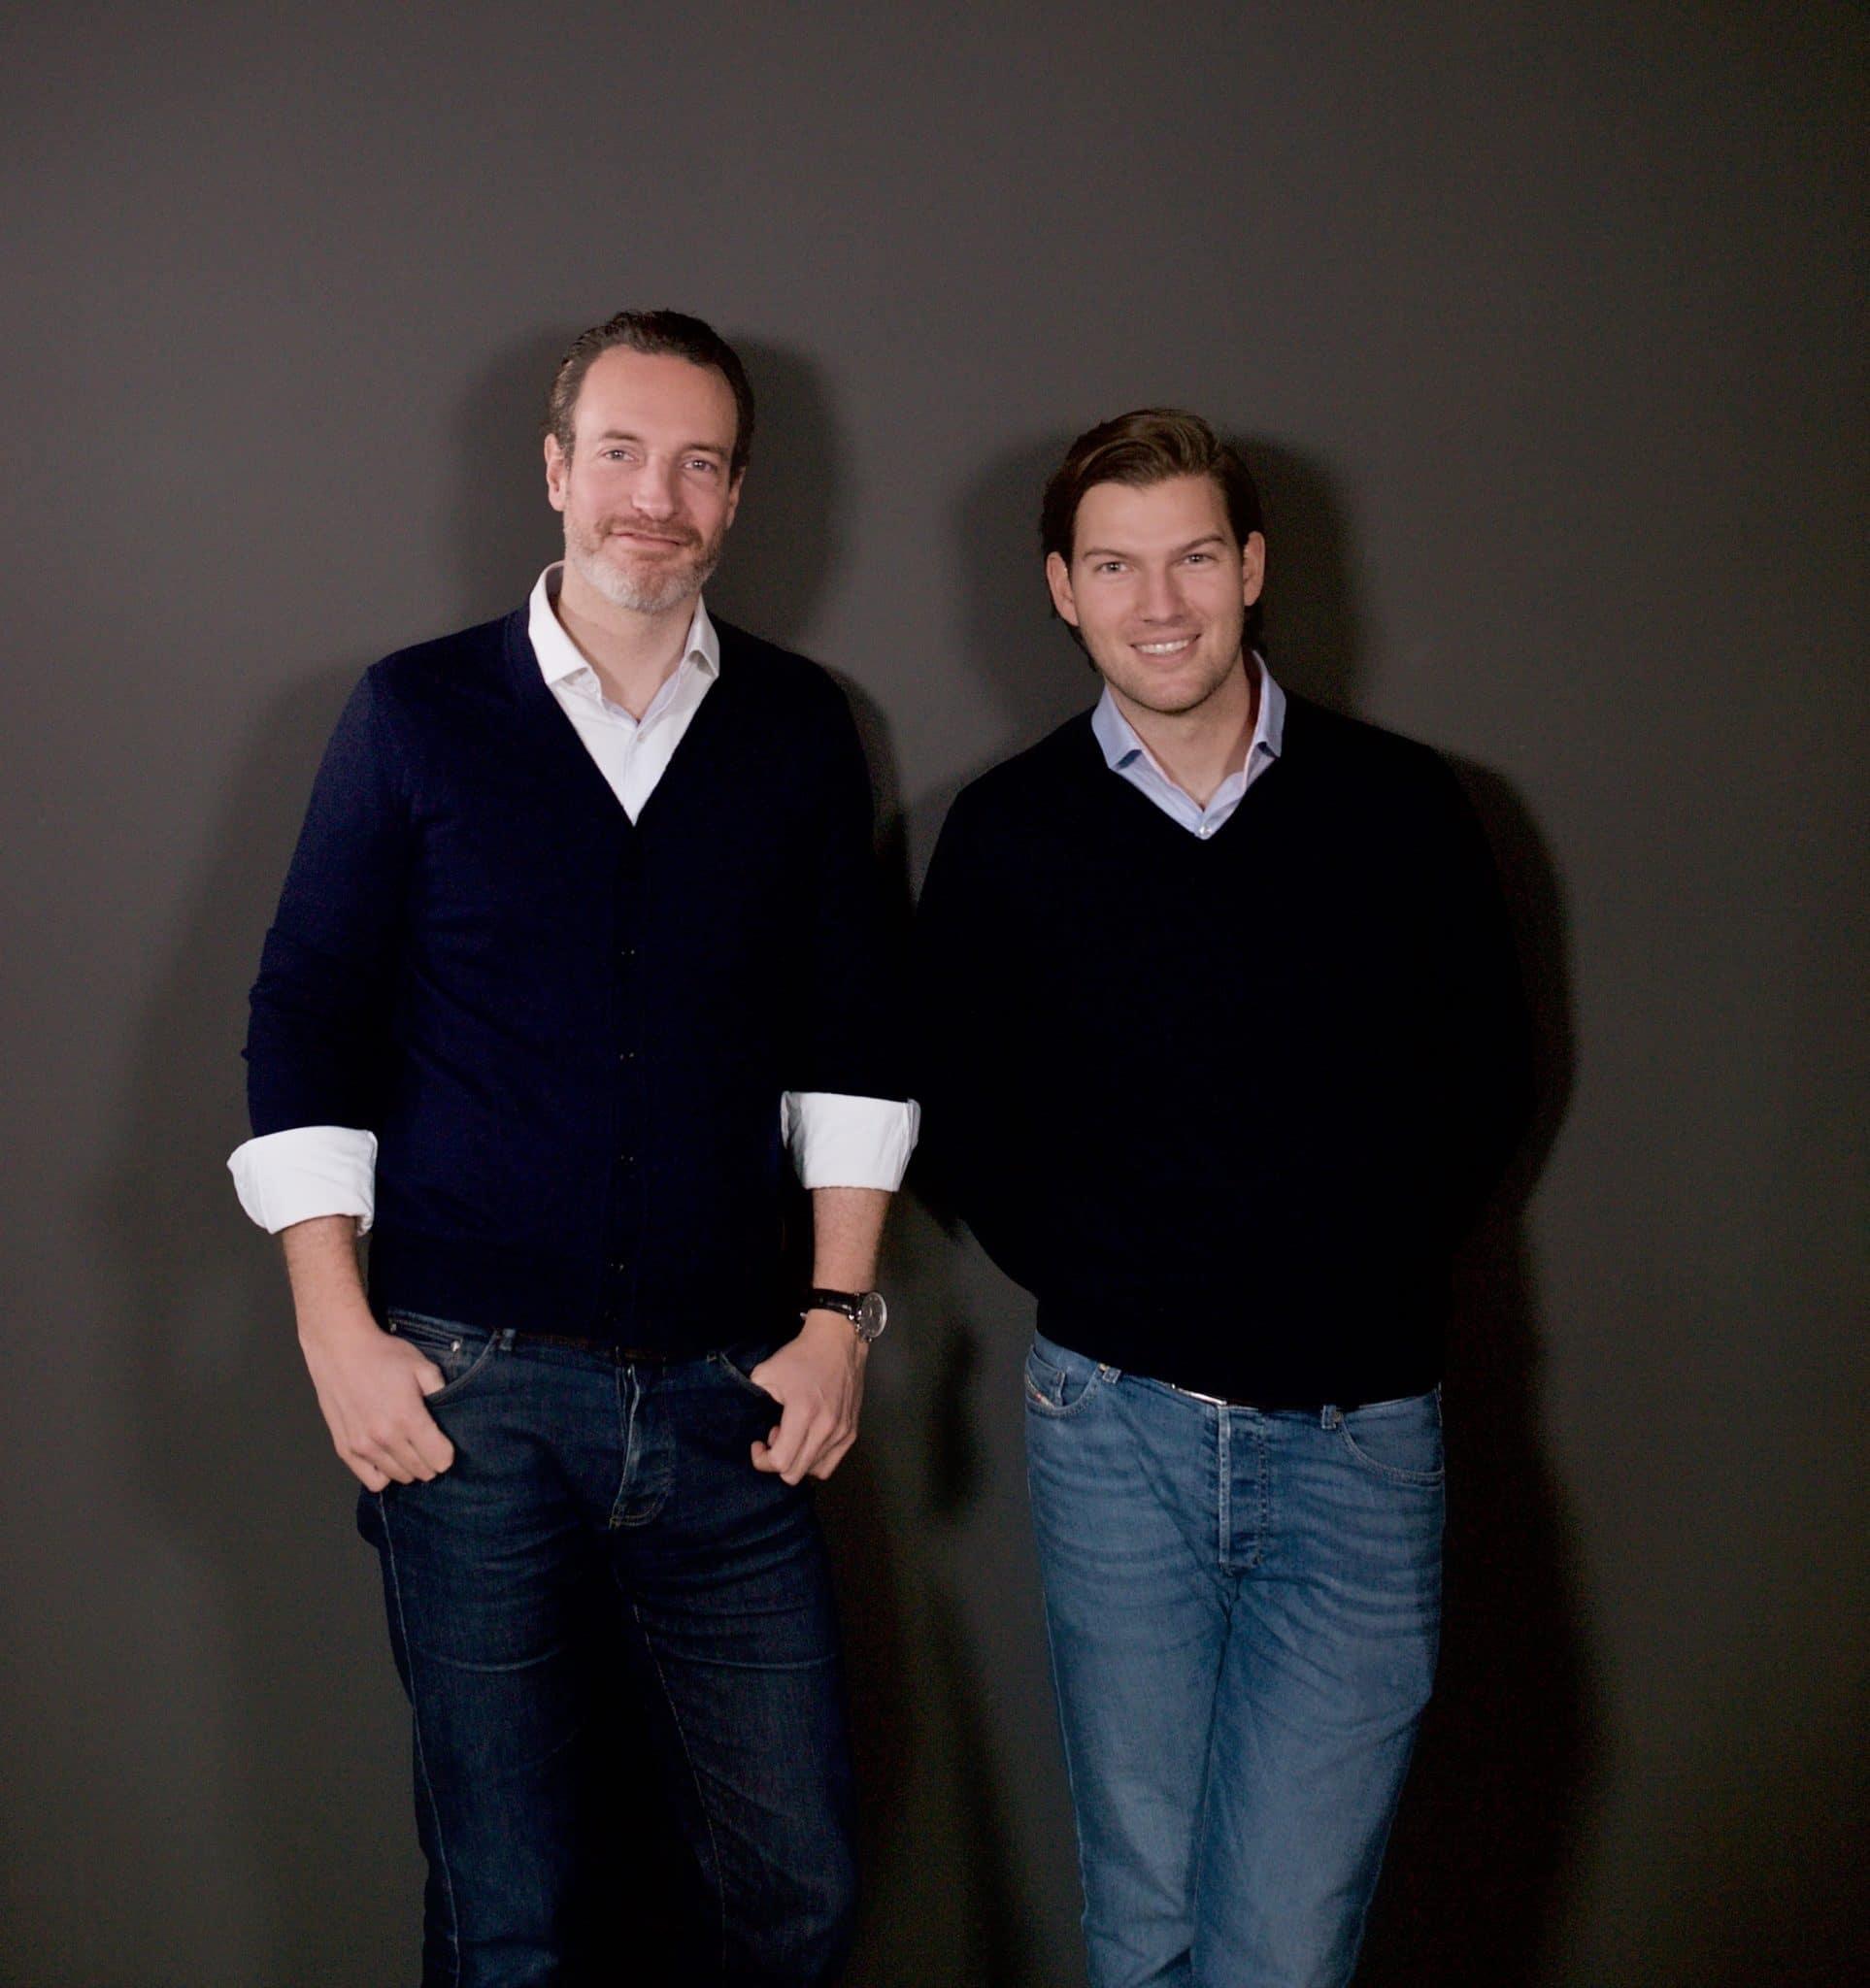 Valentin Stalf und Maximilian Tayenthal N26